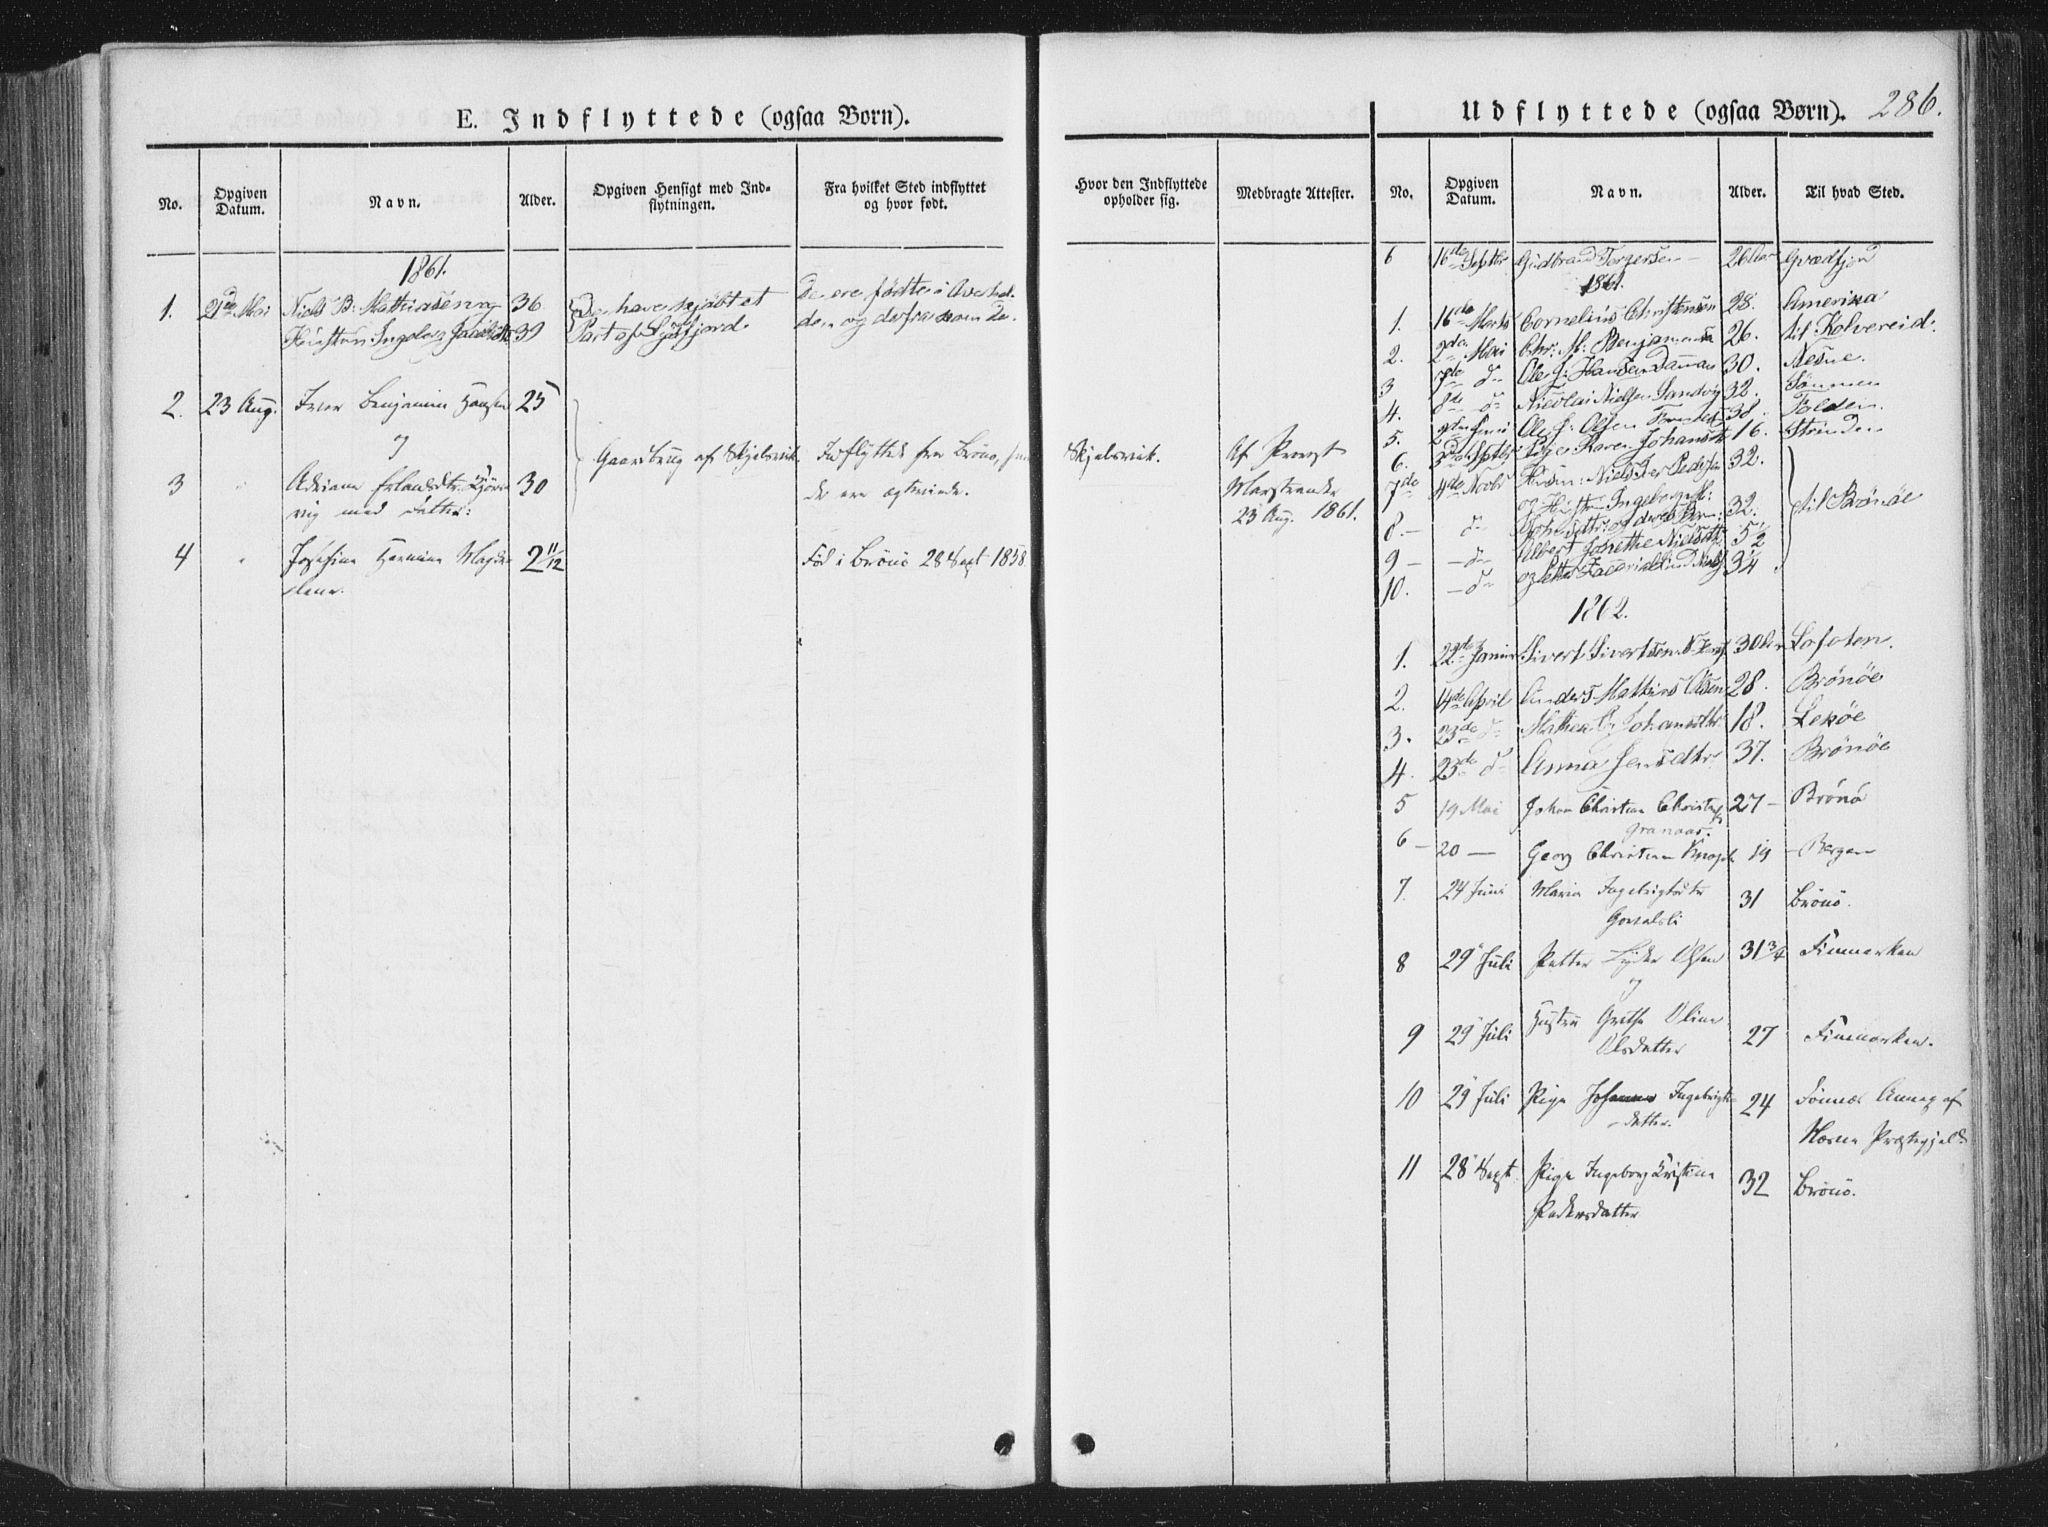 SAT, Ministerialprotokoller, klokkerbøker og fødselsregistre - Nordland, 810/L0144: Ministerialbok nr. 810A07 /1, 1841-1862, s. 286